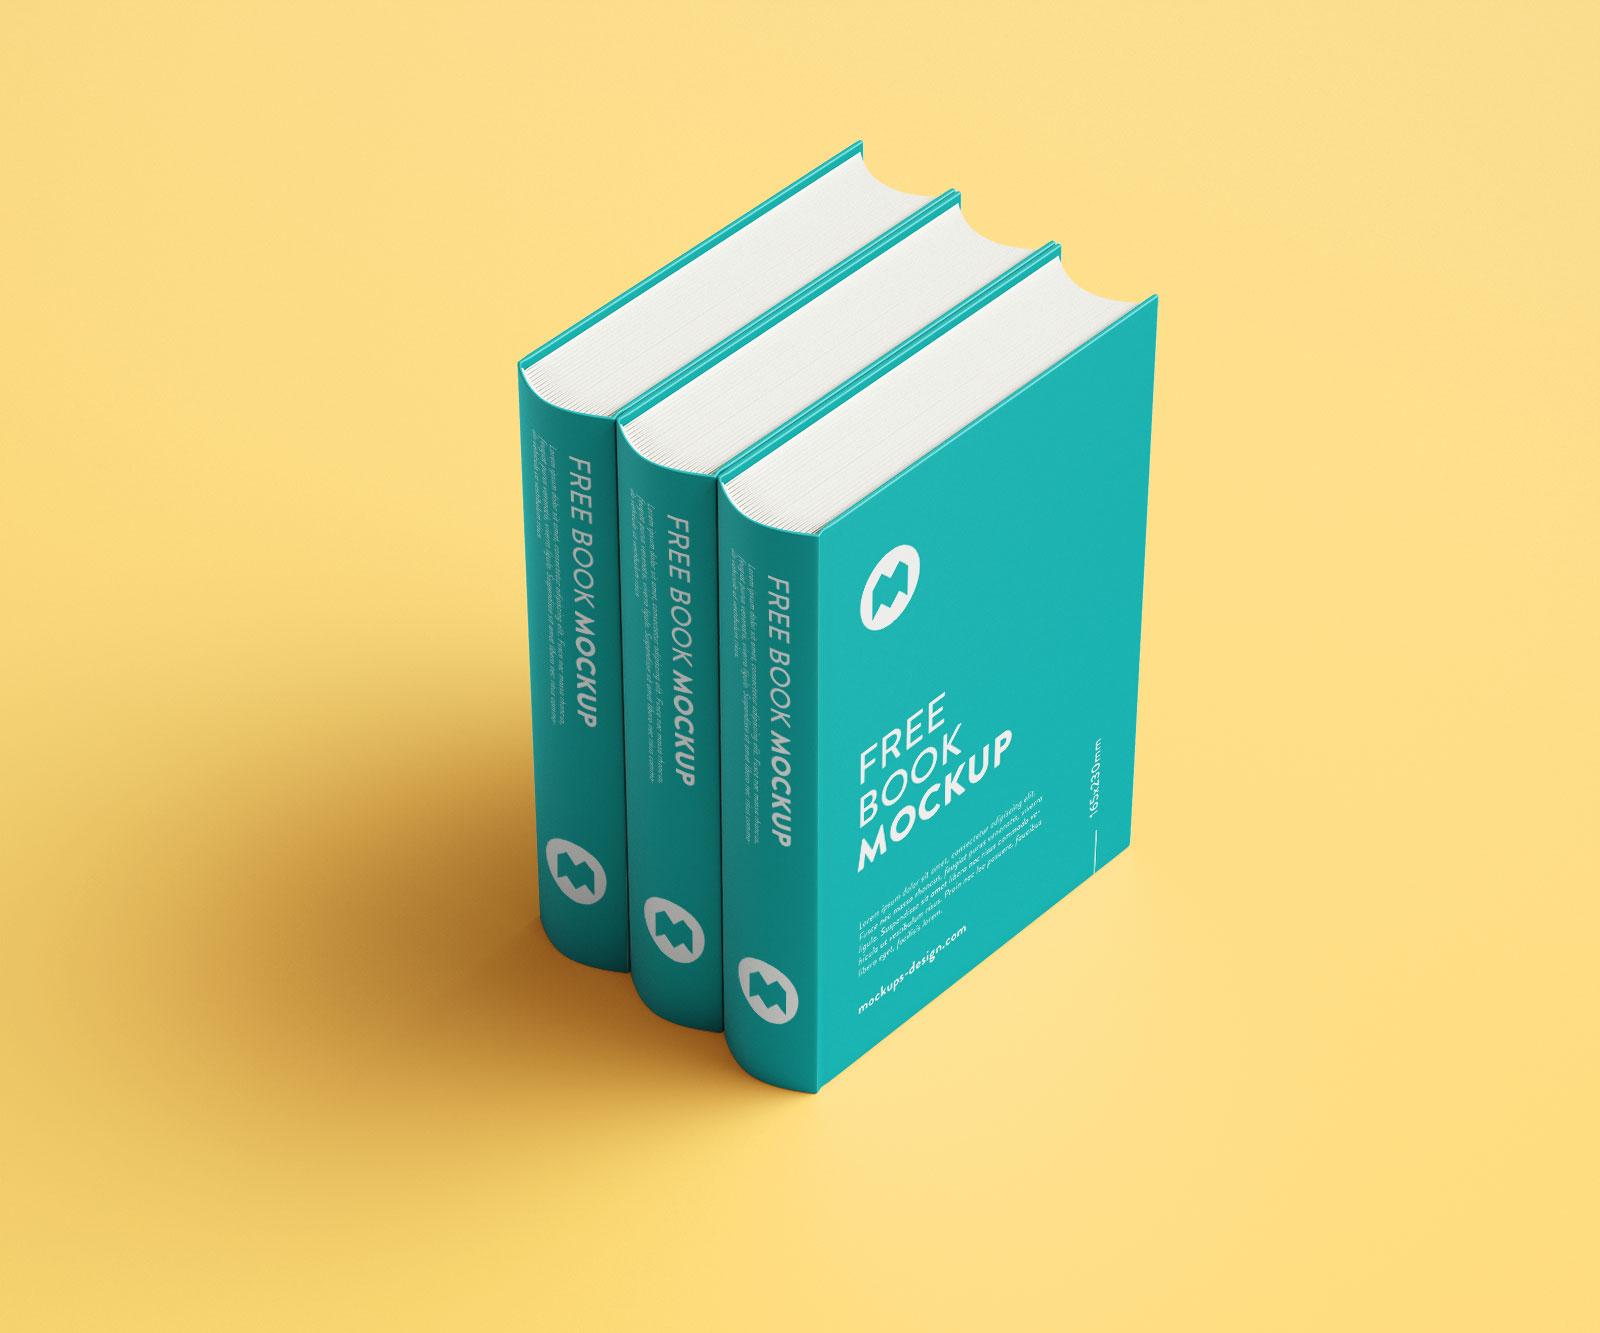 Free-Premium-Thick-Book-Mockup-PSD-9